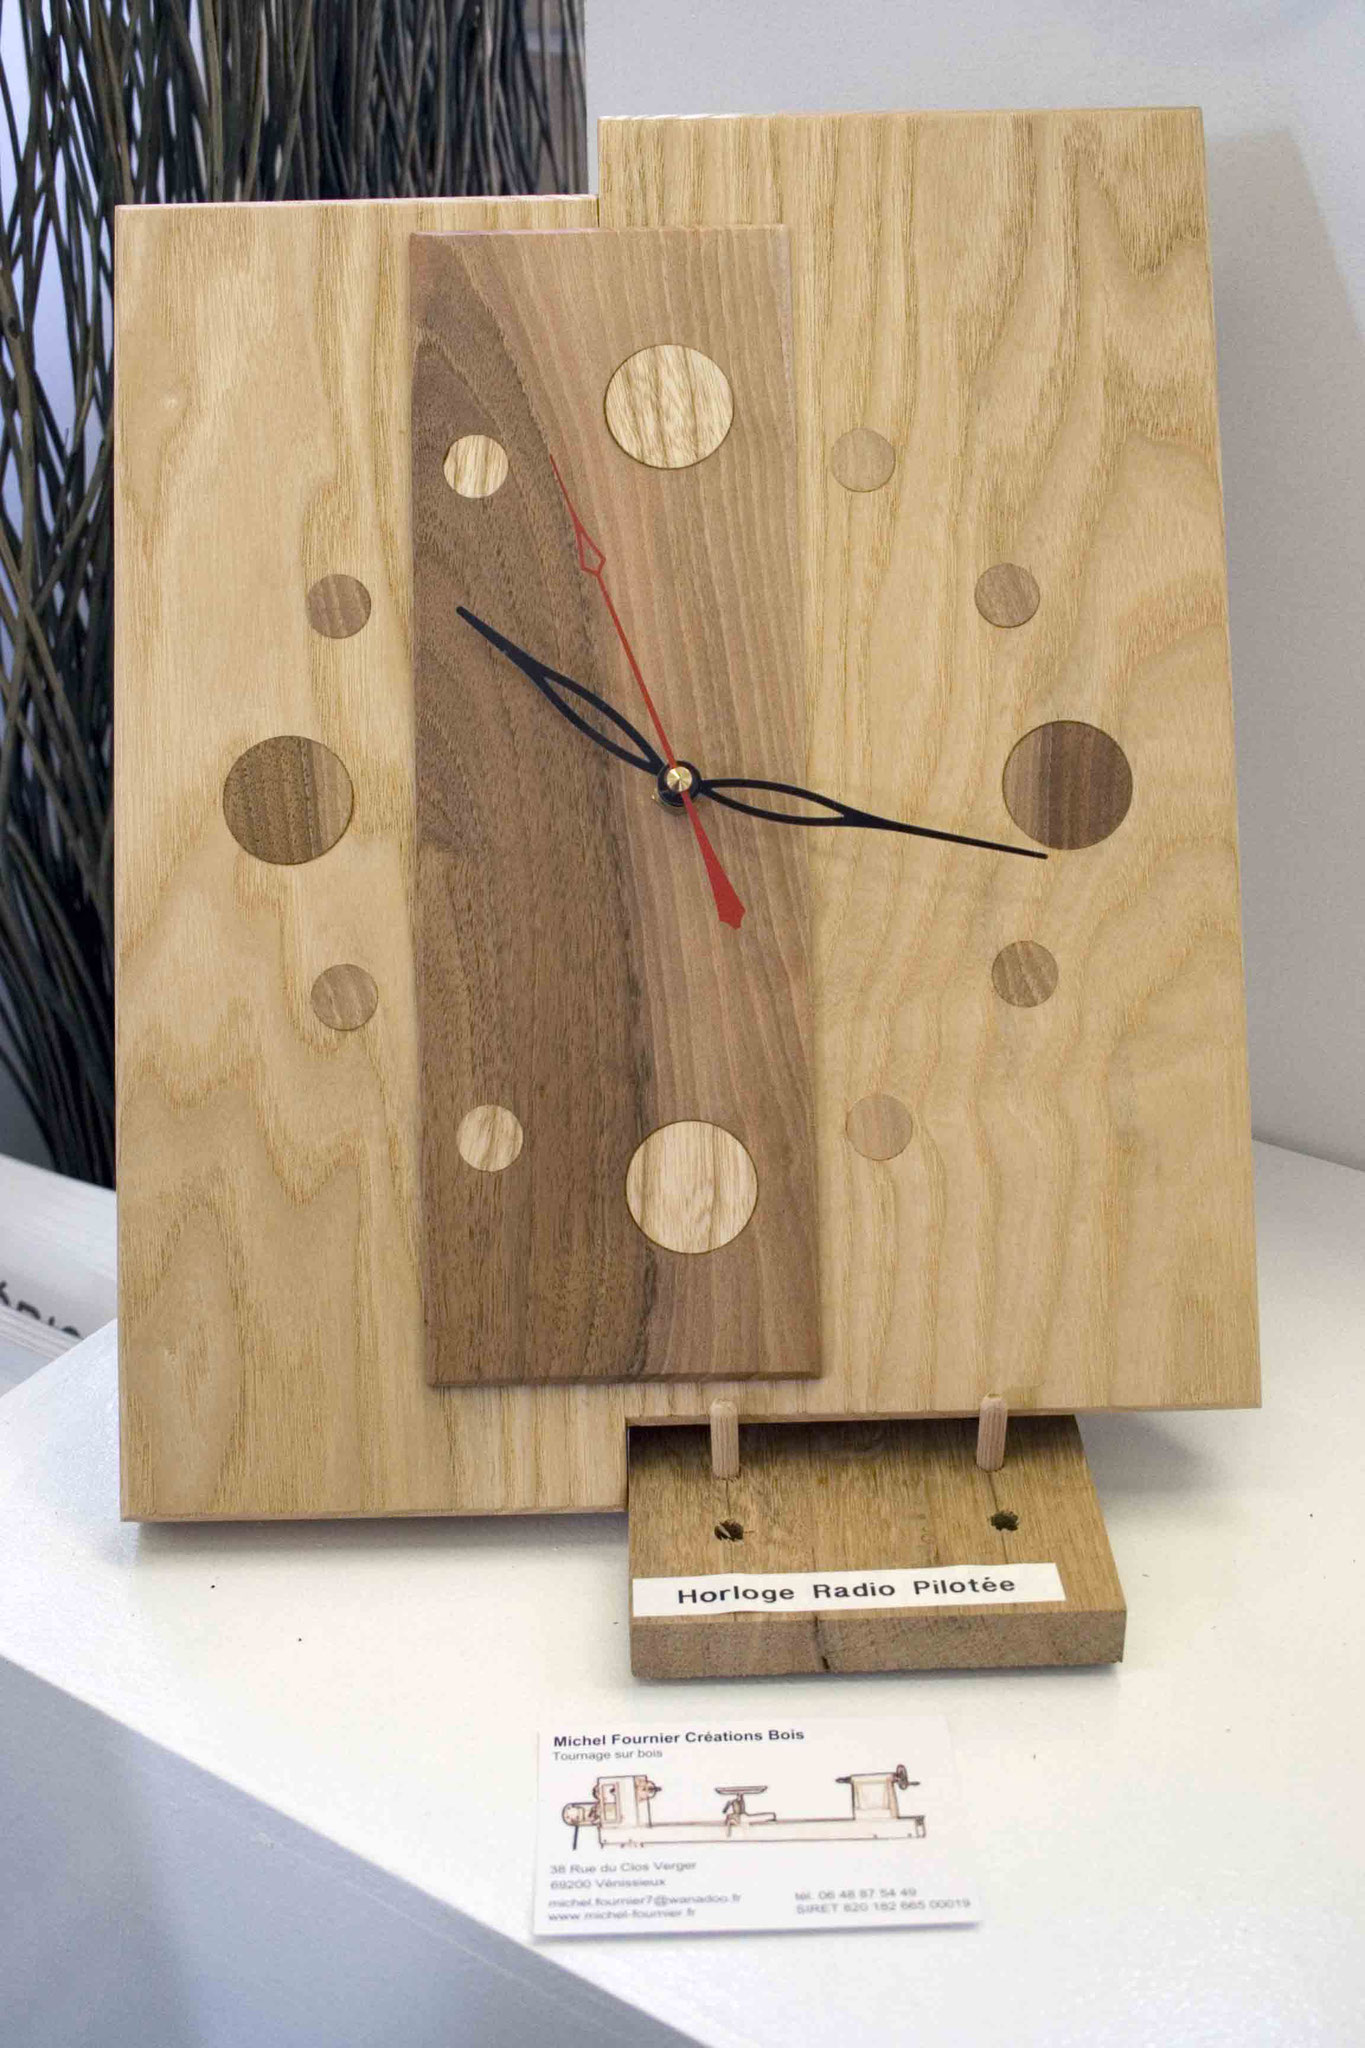 Horloge radio-pilotée